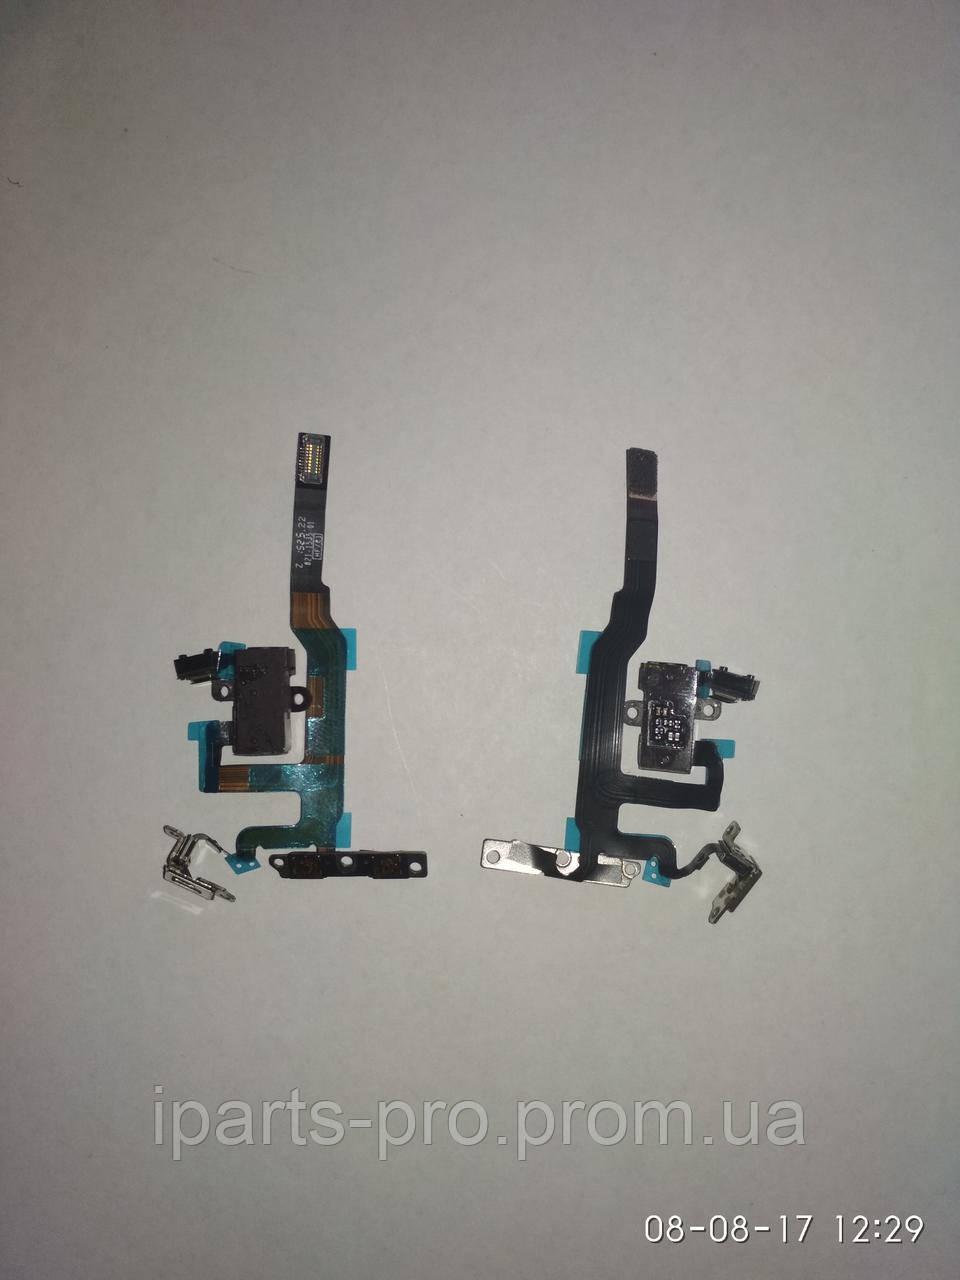 Шлейф для iPhone 4s Hand-Free orig БЕЛЫЙ